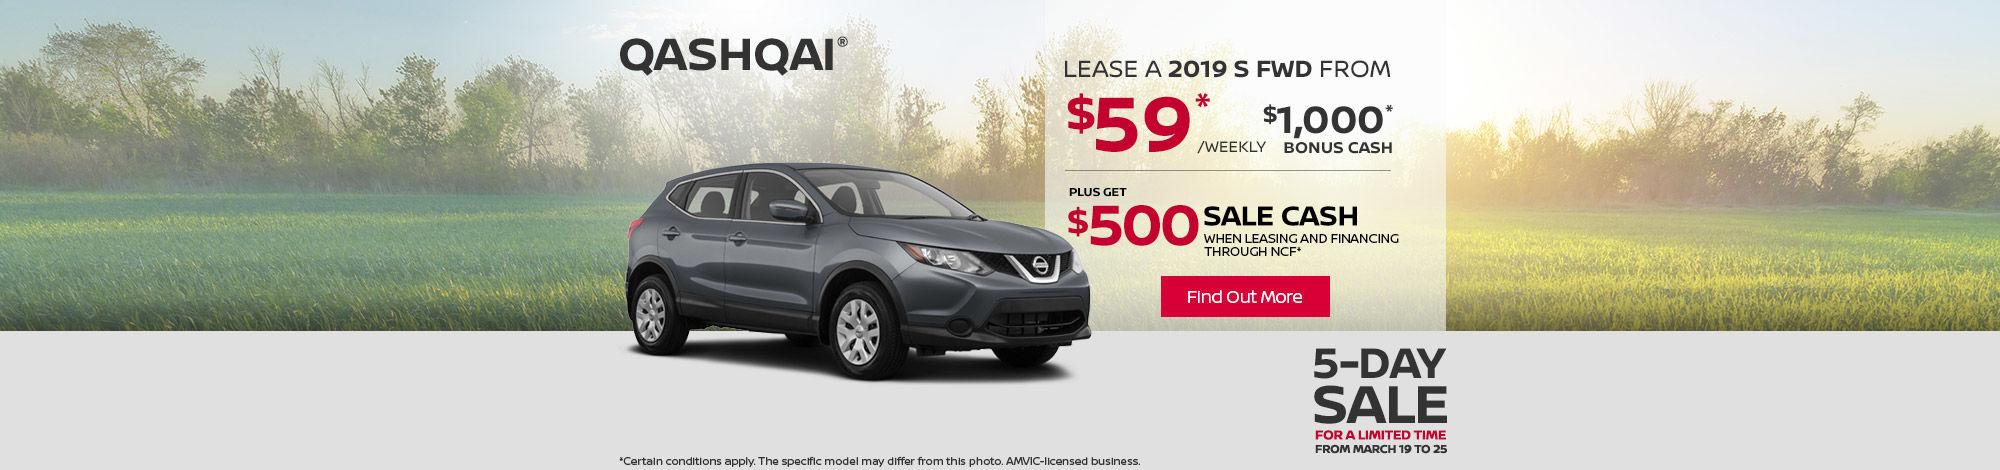 2019 Nissan Qashqai - 5 day sale